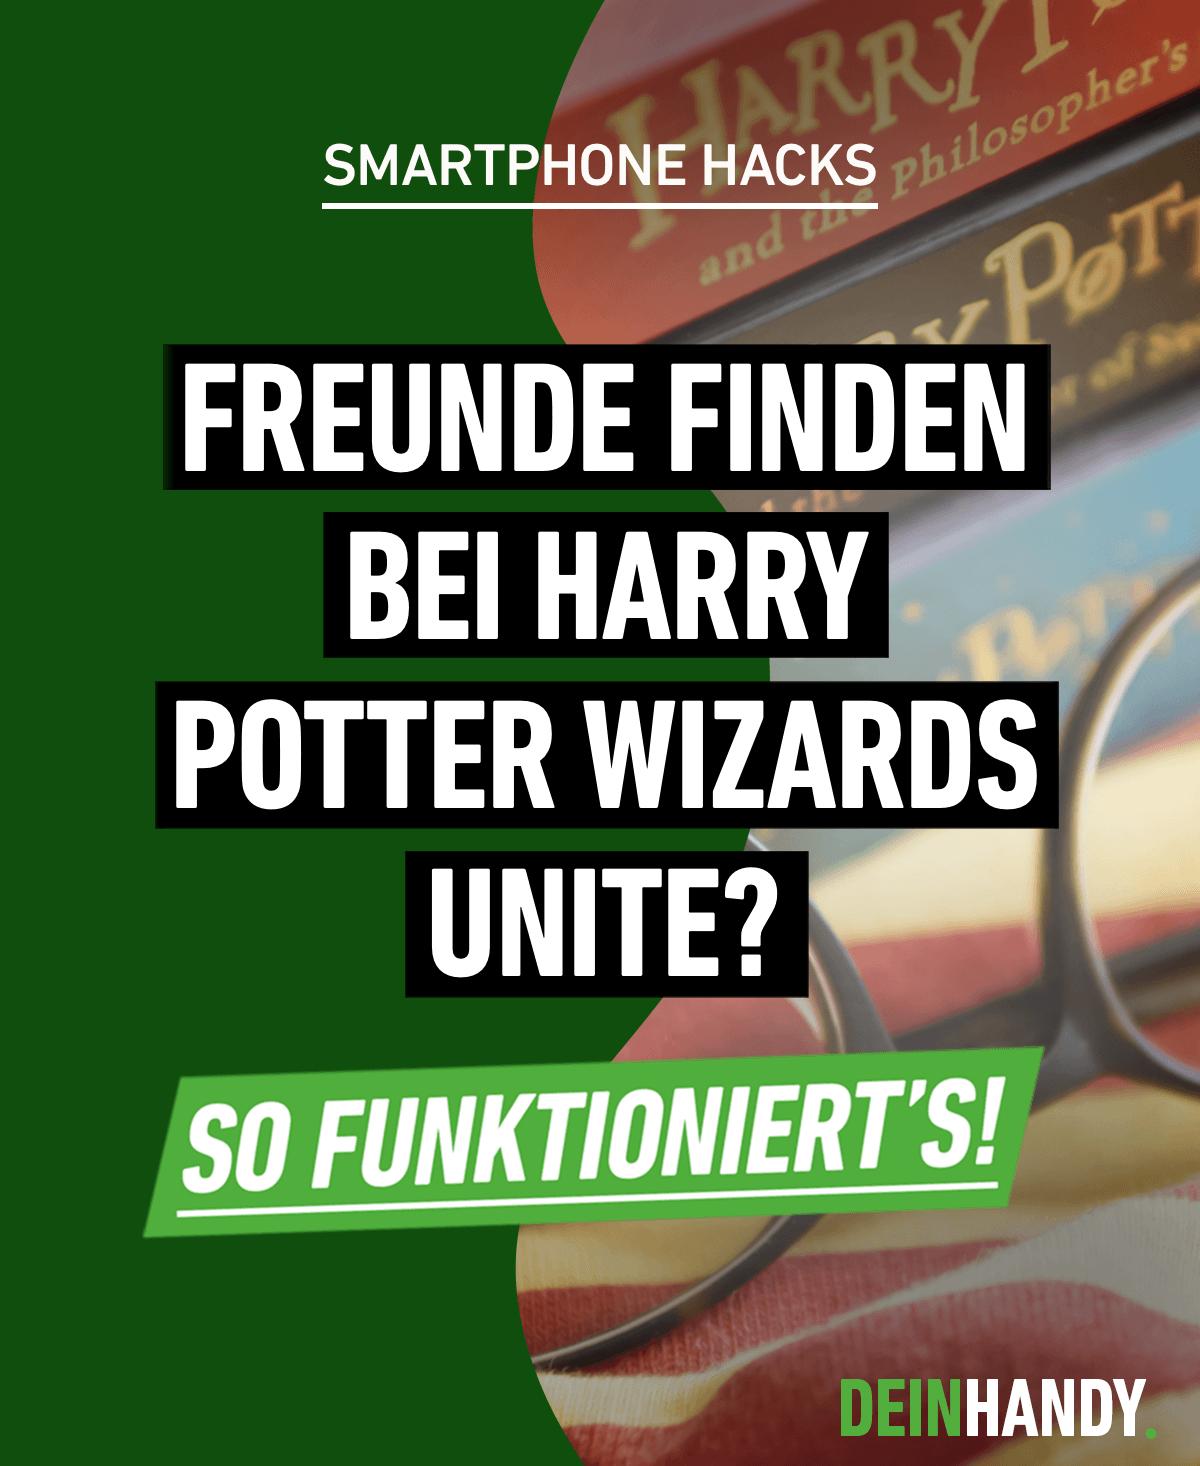 Harry Potter Wizards Unite Freunde Finden Freundescode Sammlung Freunde Finden Harry Potter Freunde